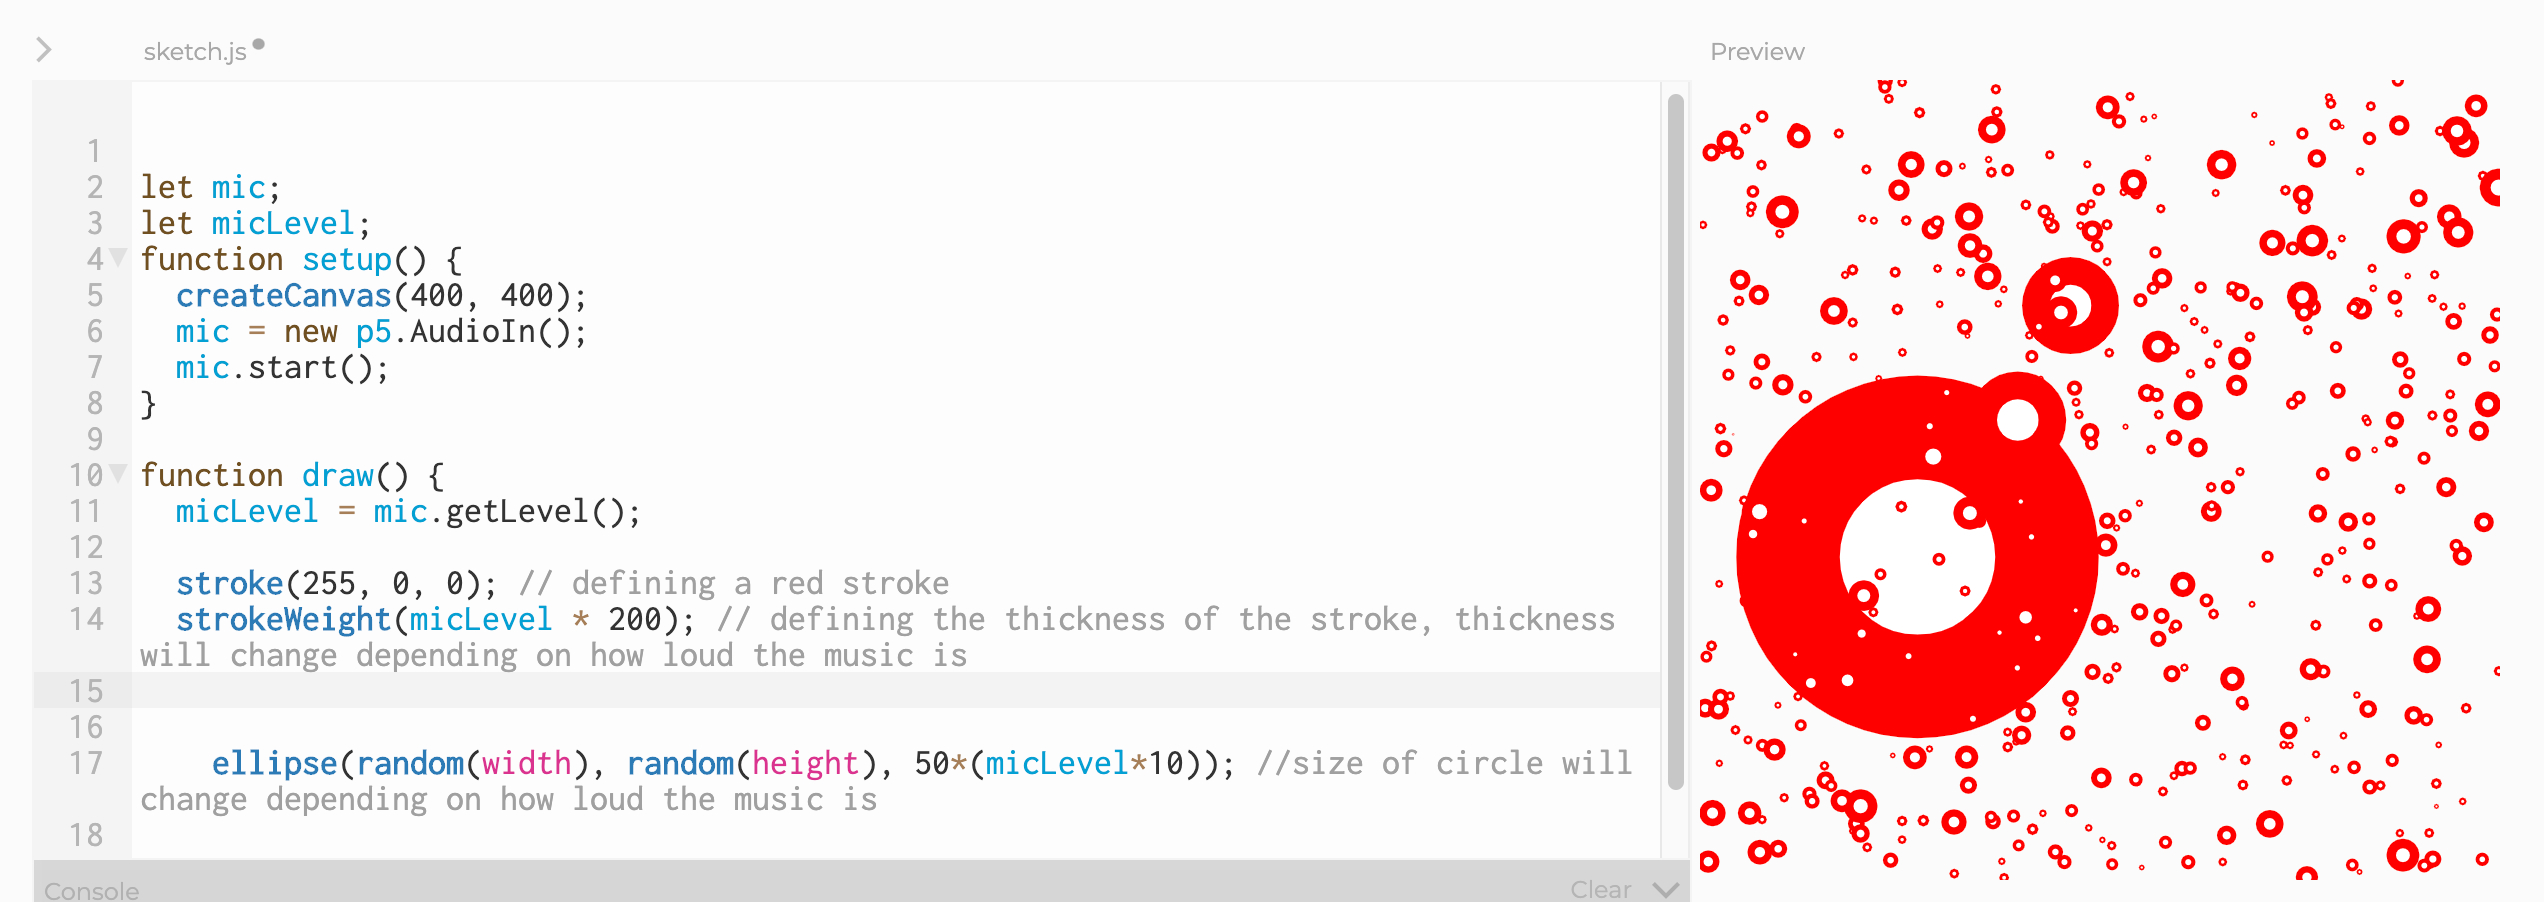 /beginner-p5js-tutorial-a-spacycloud-live-workshop-retrospective-2r9f3yp0 feature image